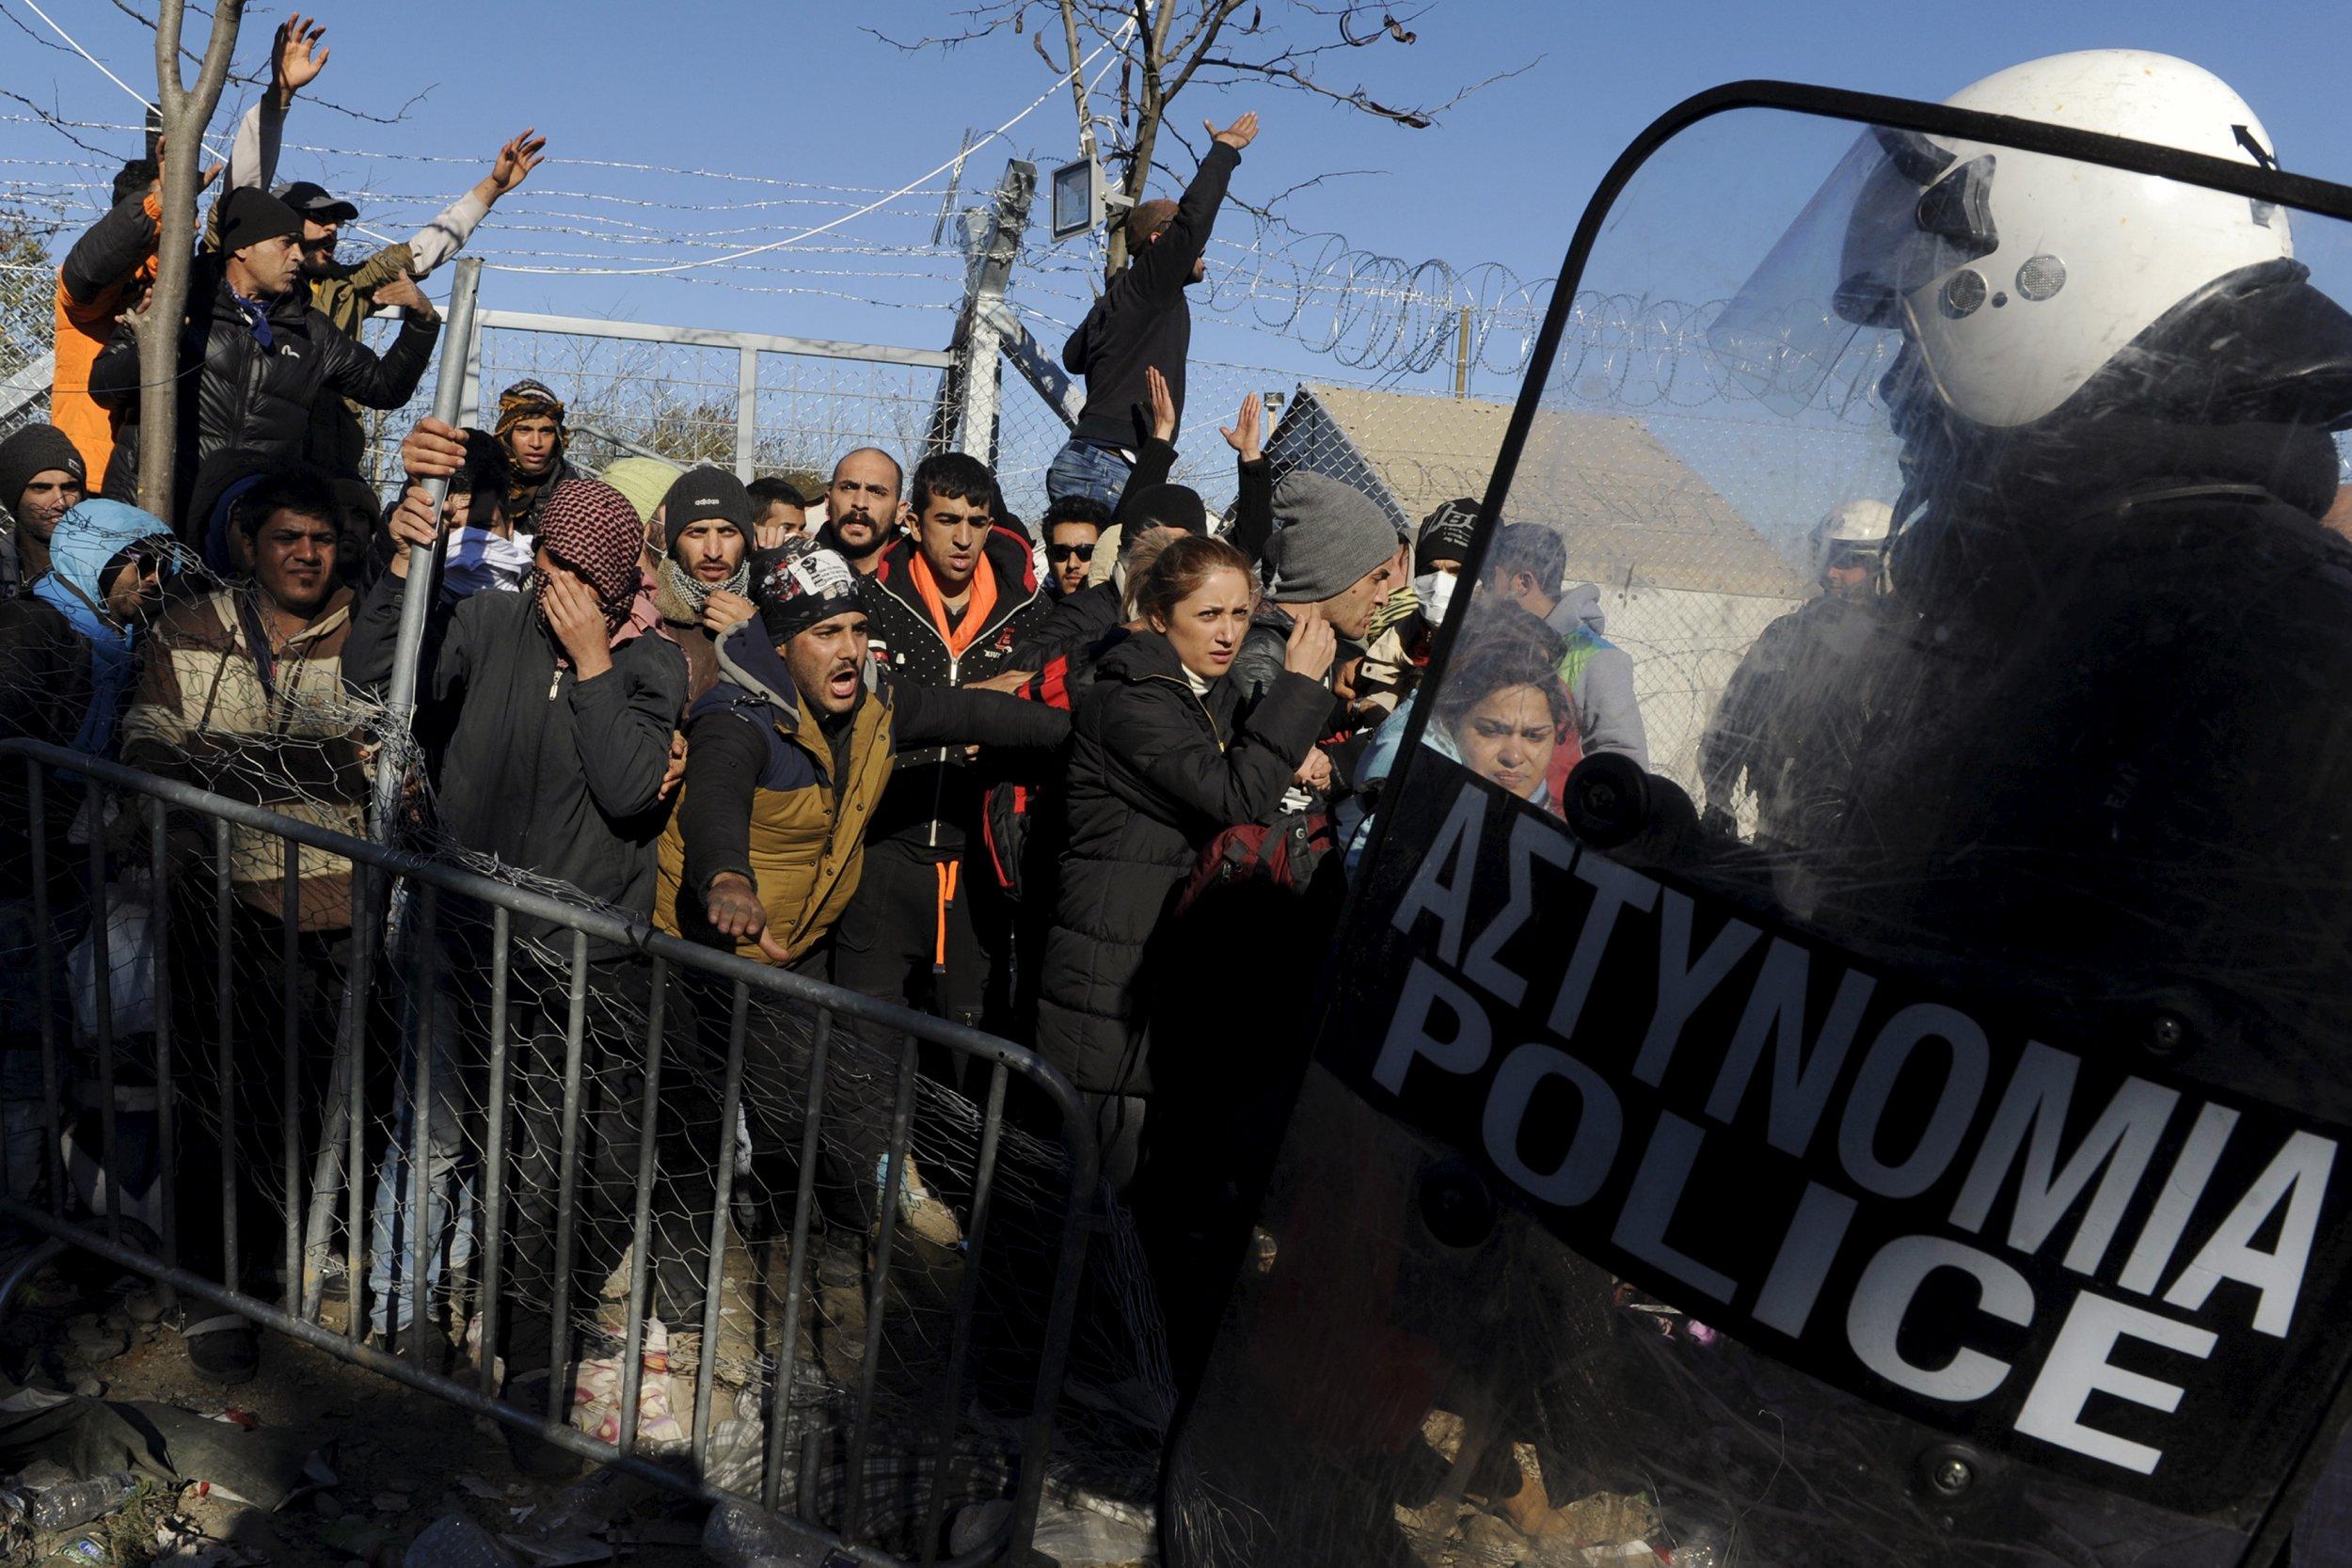 0203_Greece_Macedonia_Refugees_Idomeni